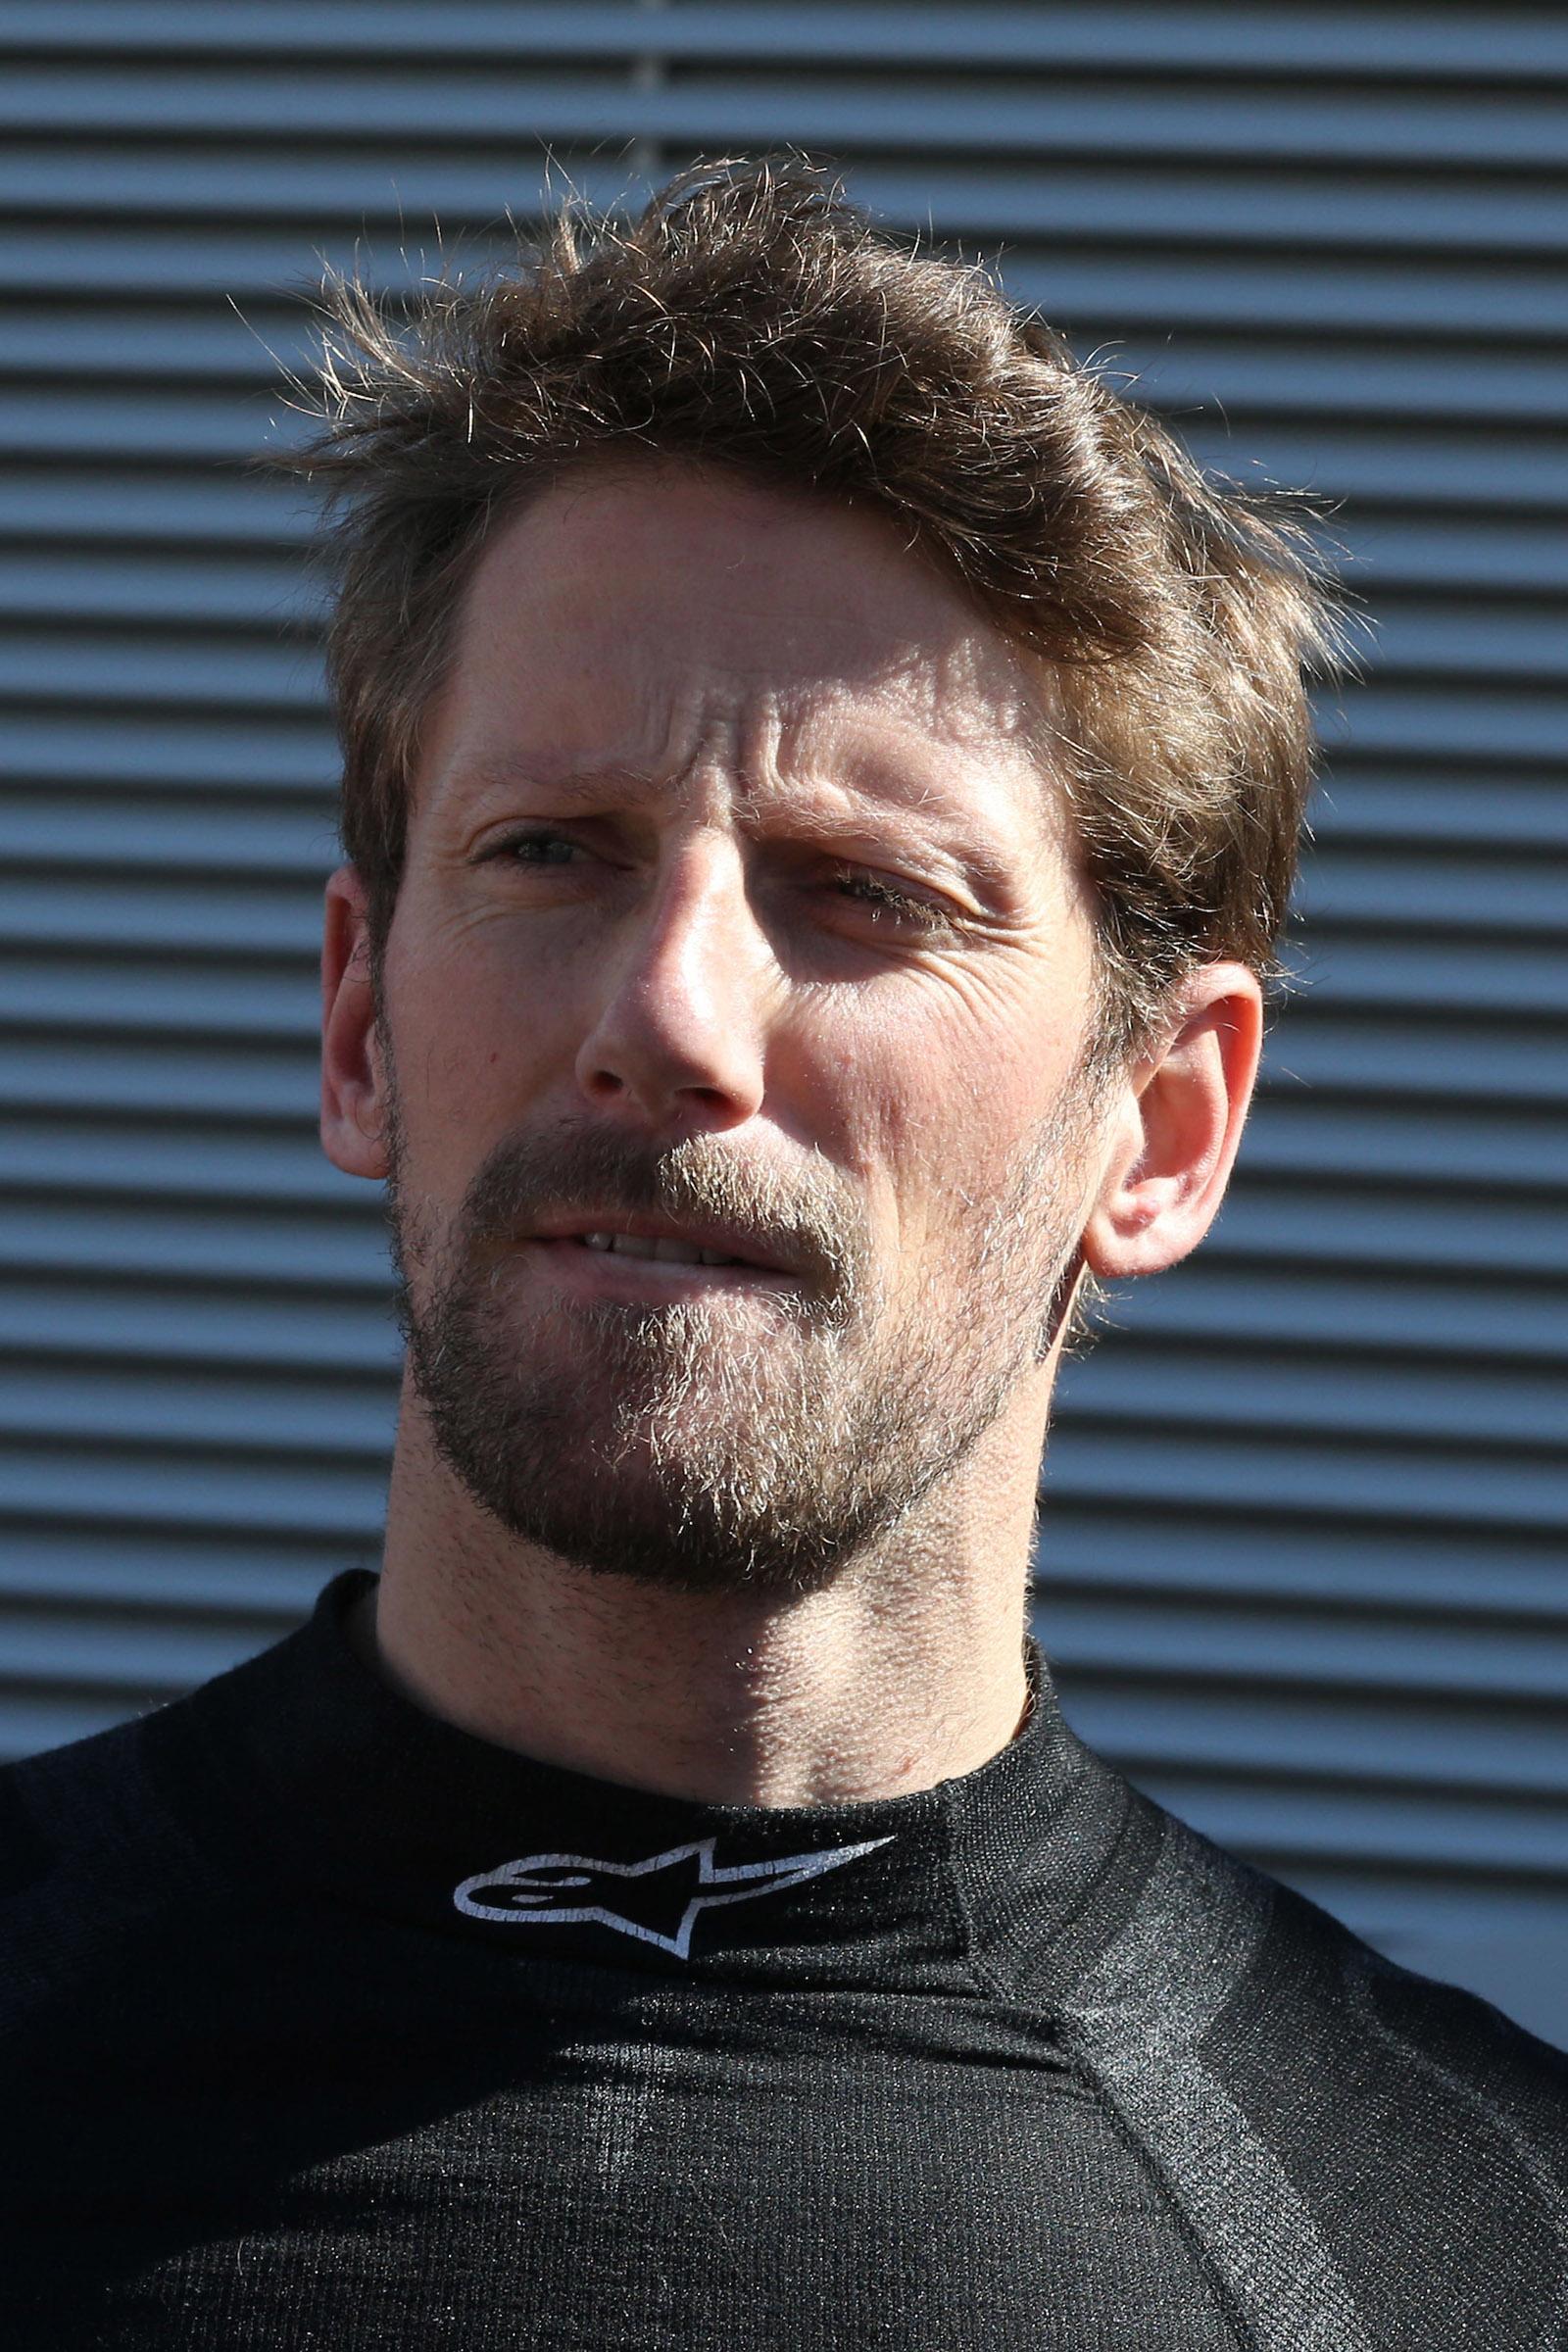 Romain Grosjean in Haas overalls